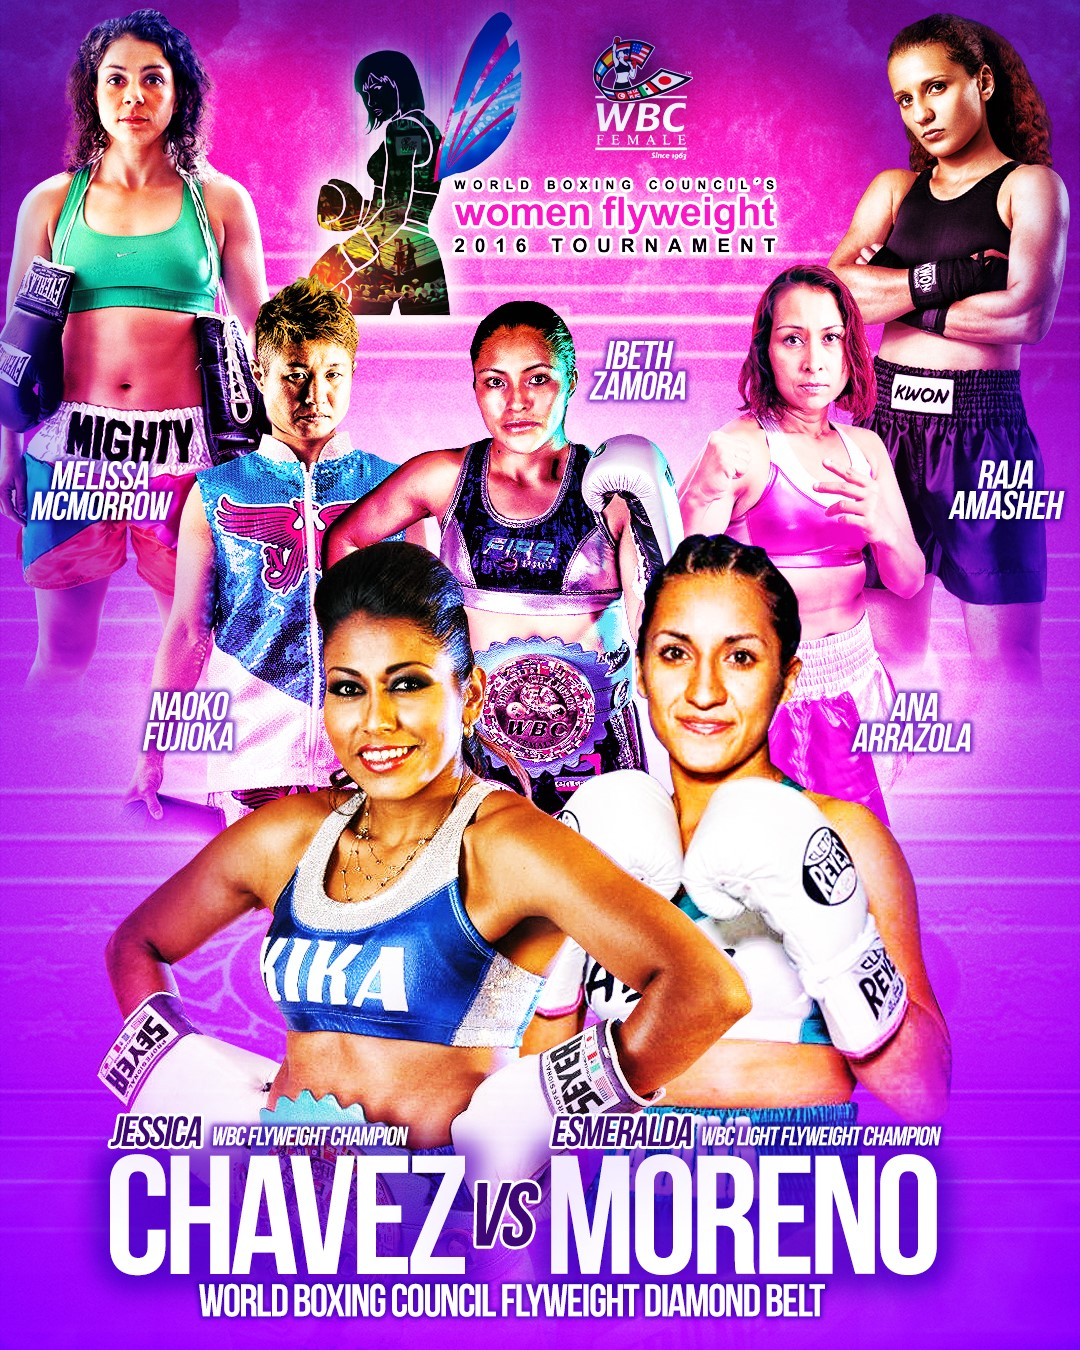 Chavez vs. Moreno WBC Diamond Belt Championship to Contribute to Mexico Earthquake Relief